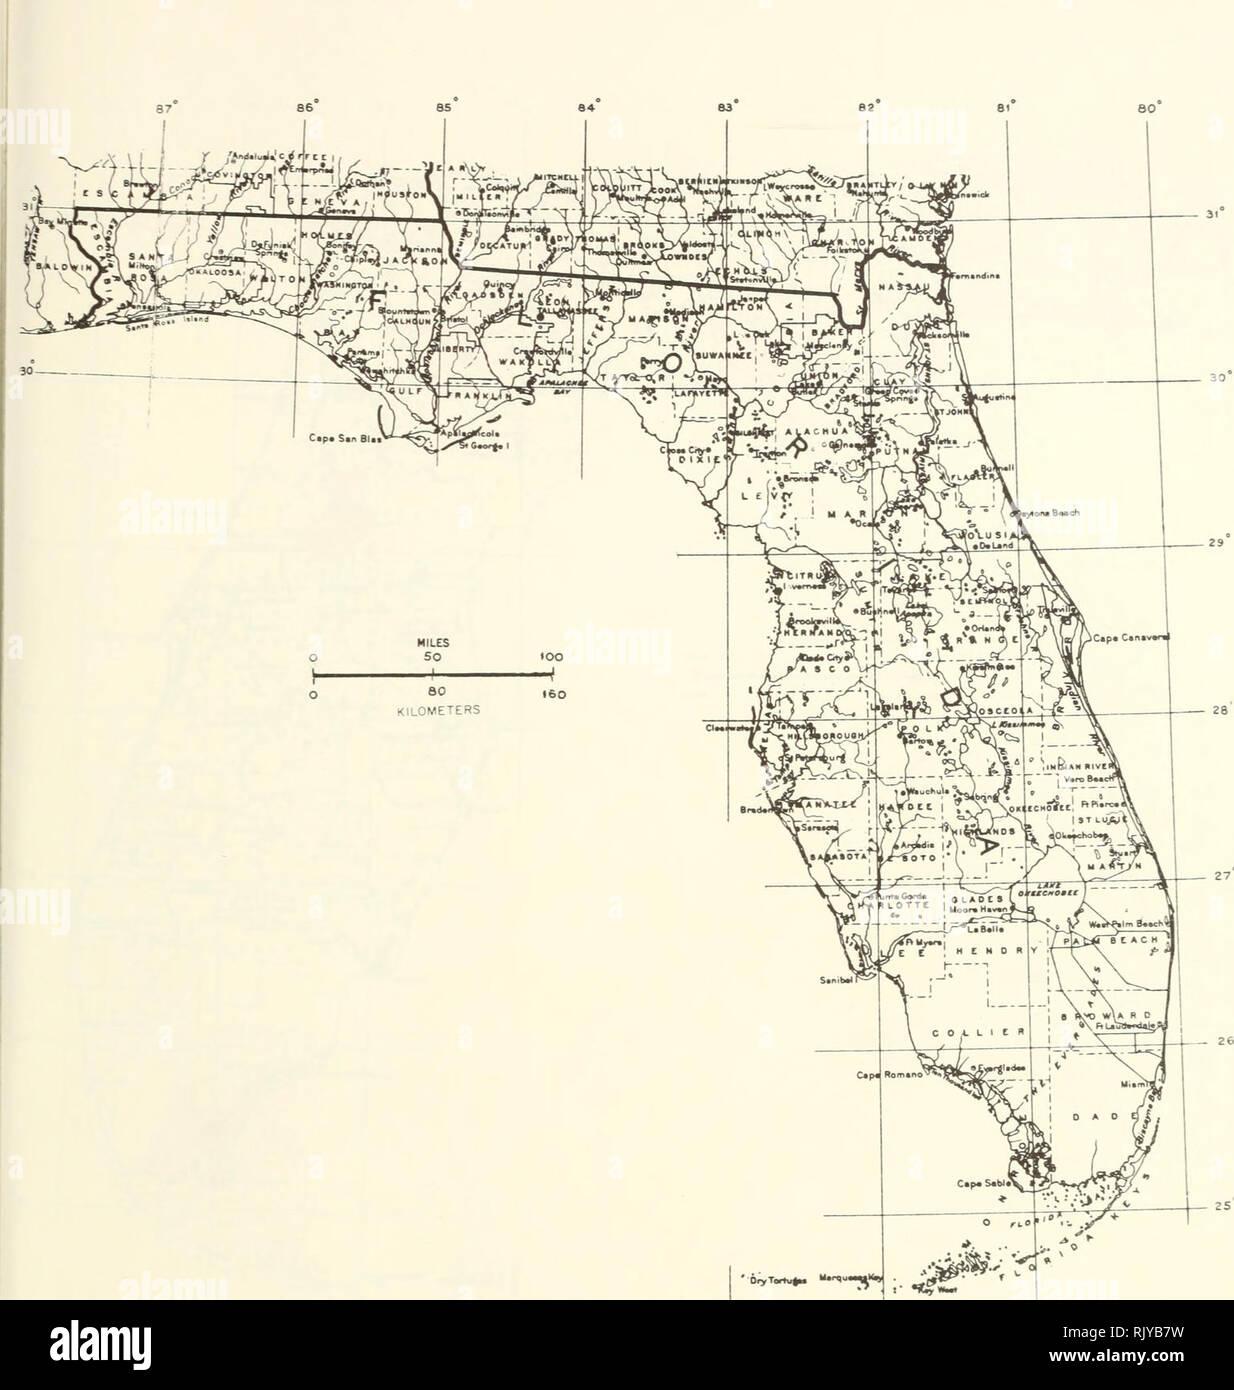 Map Of Florida Counties Stock Photos Map Of Florida Counties Stock